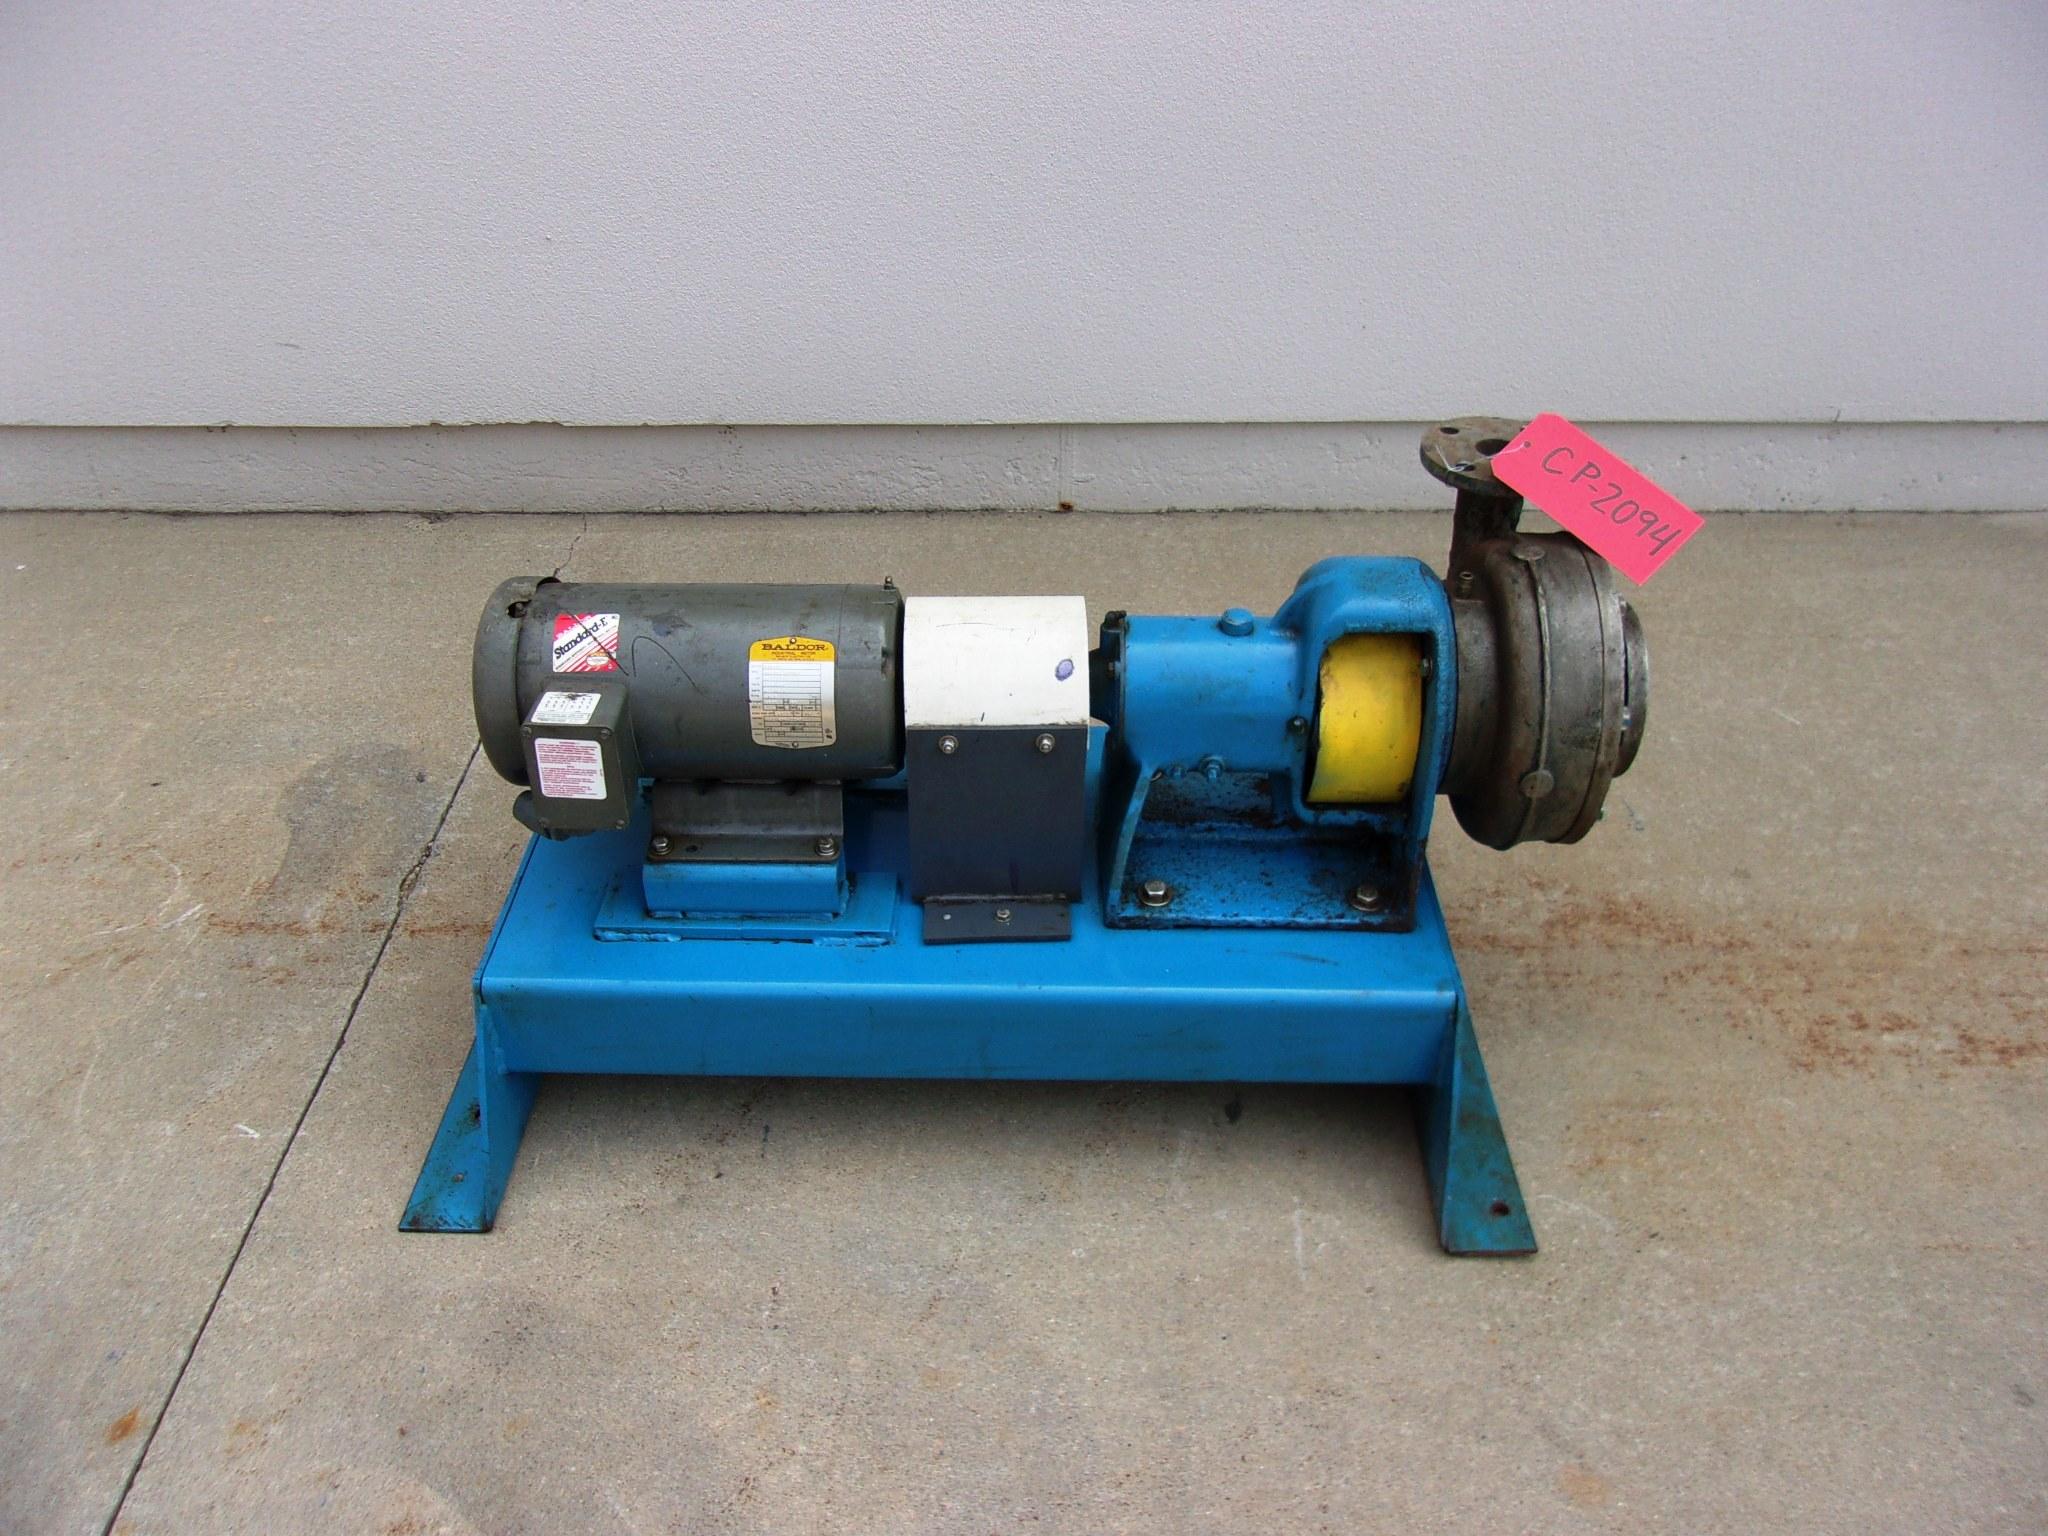 "Used Centrifugal Pump - Worthington 3 HP 2"" Inlet 1.5"" Outlet Centrifugal Pump-Pumps - Centrifugal"